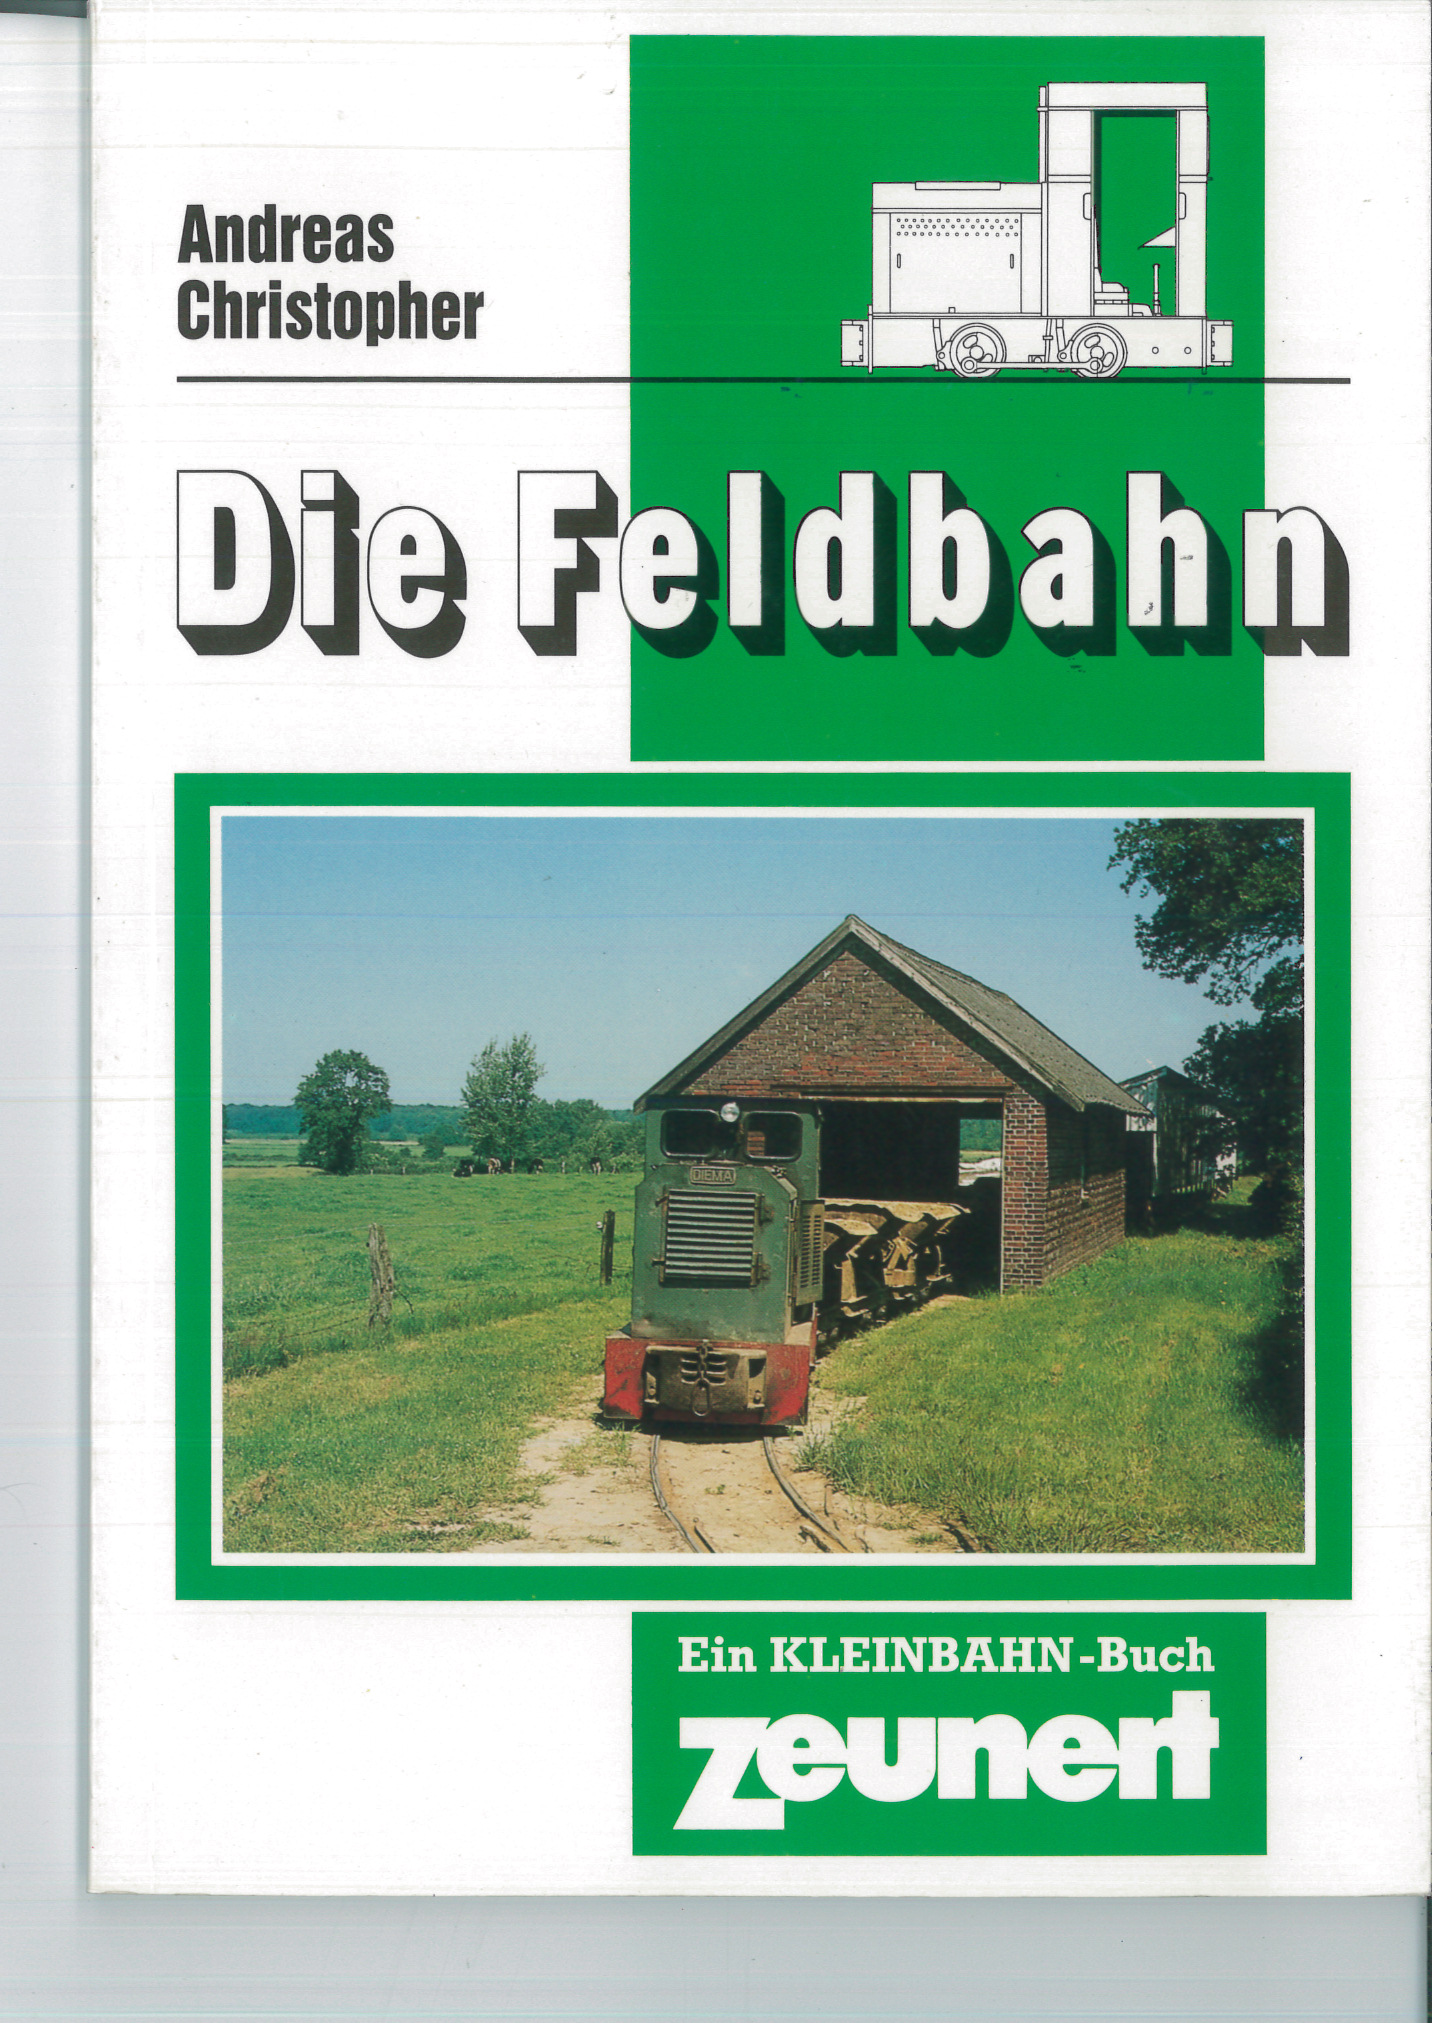 Die Feldbahn, Band 1 - Andreas Christopher, Zeunert Verlag | günstig bestellen bei Modelleisenbahn Center  MCS Vertriebs GmbH